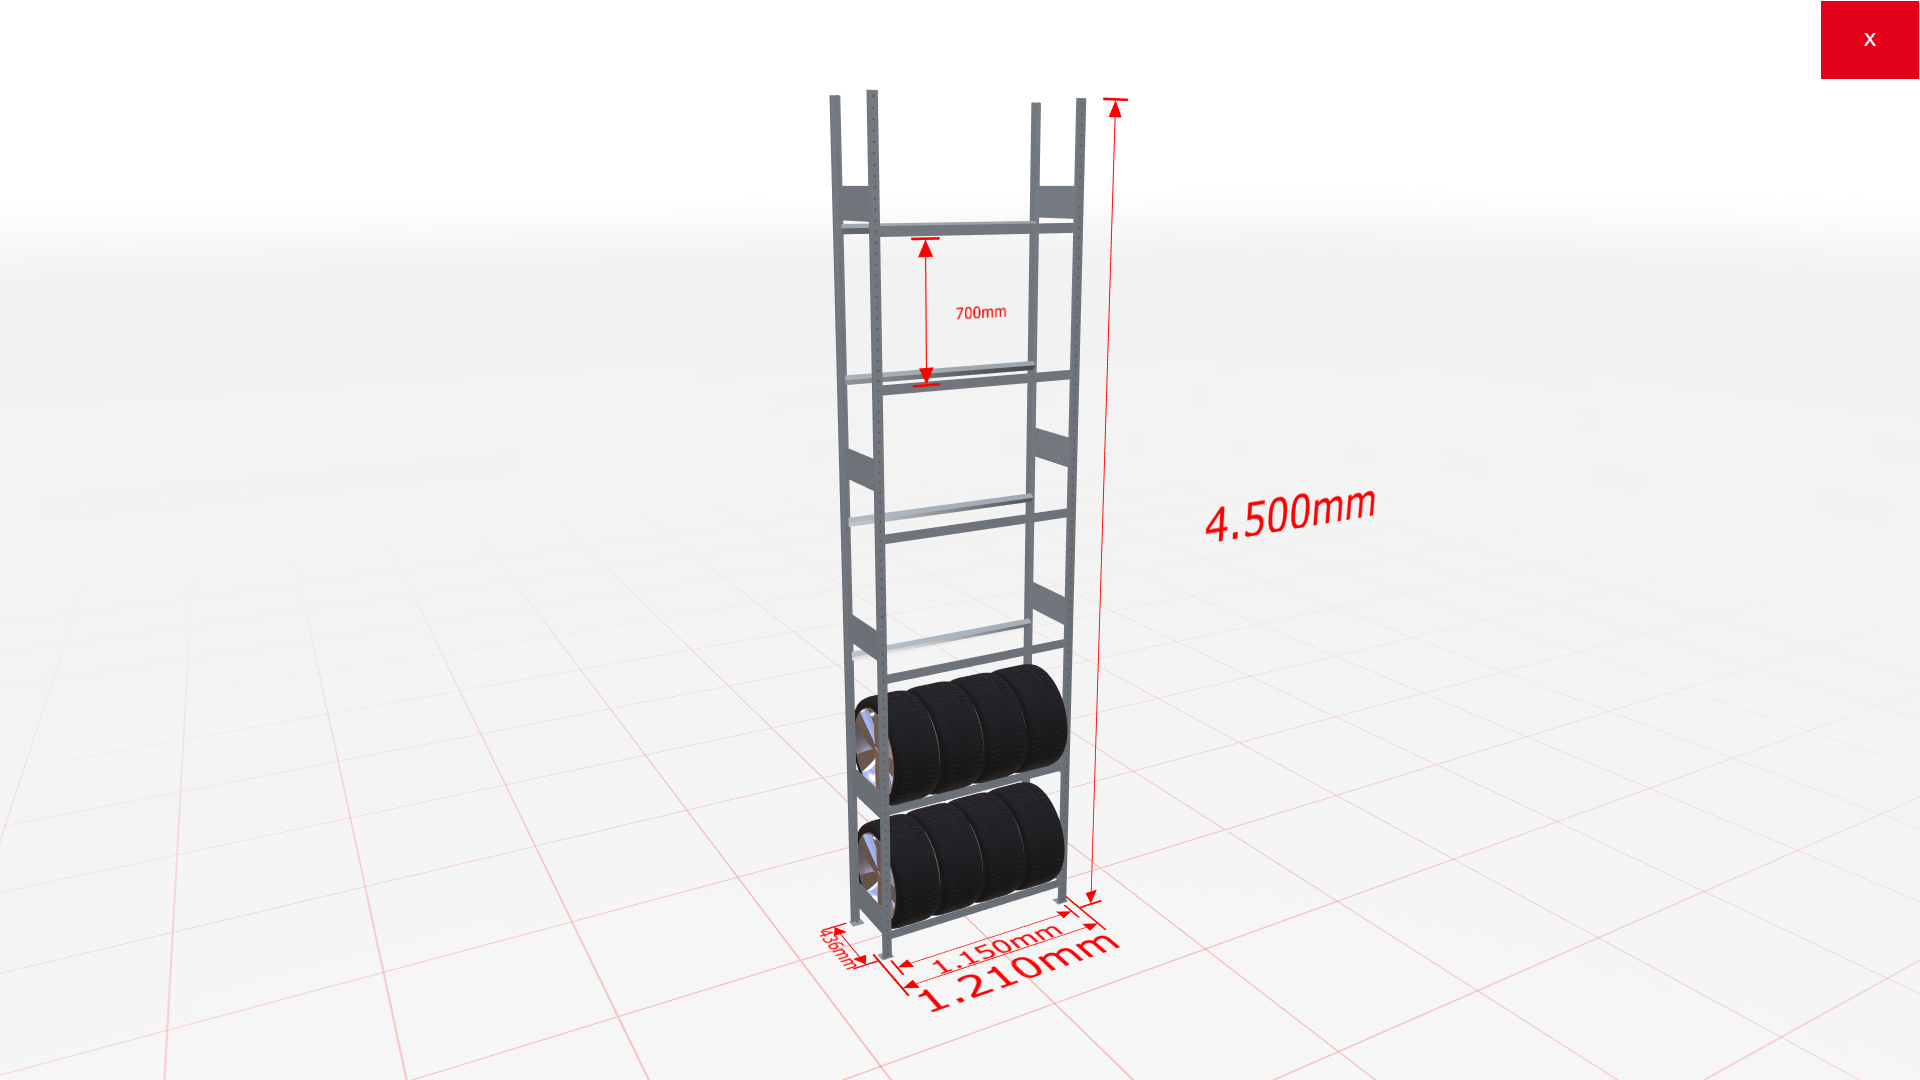 Räderregal Grundregal SCHULTE Lagertechnik 4500x1150x400 mm – 6 Ebenen á 1150 mm, verzinkt